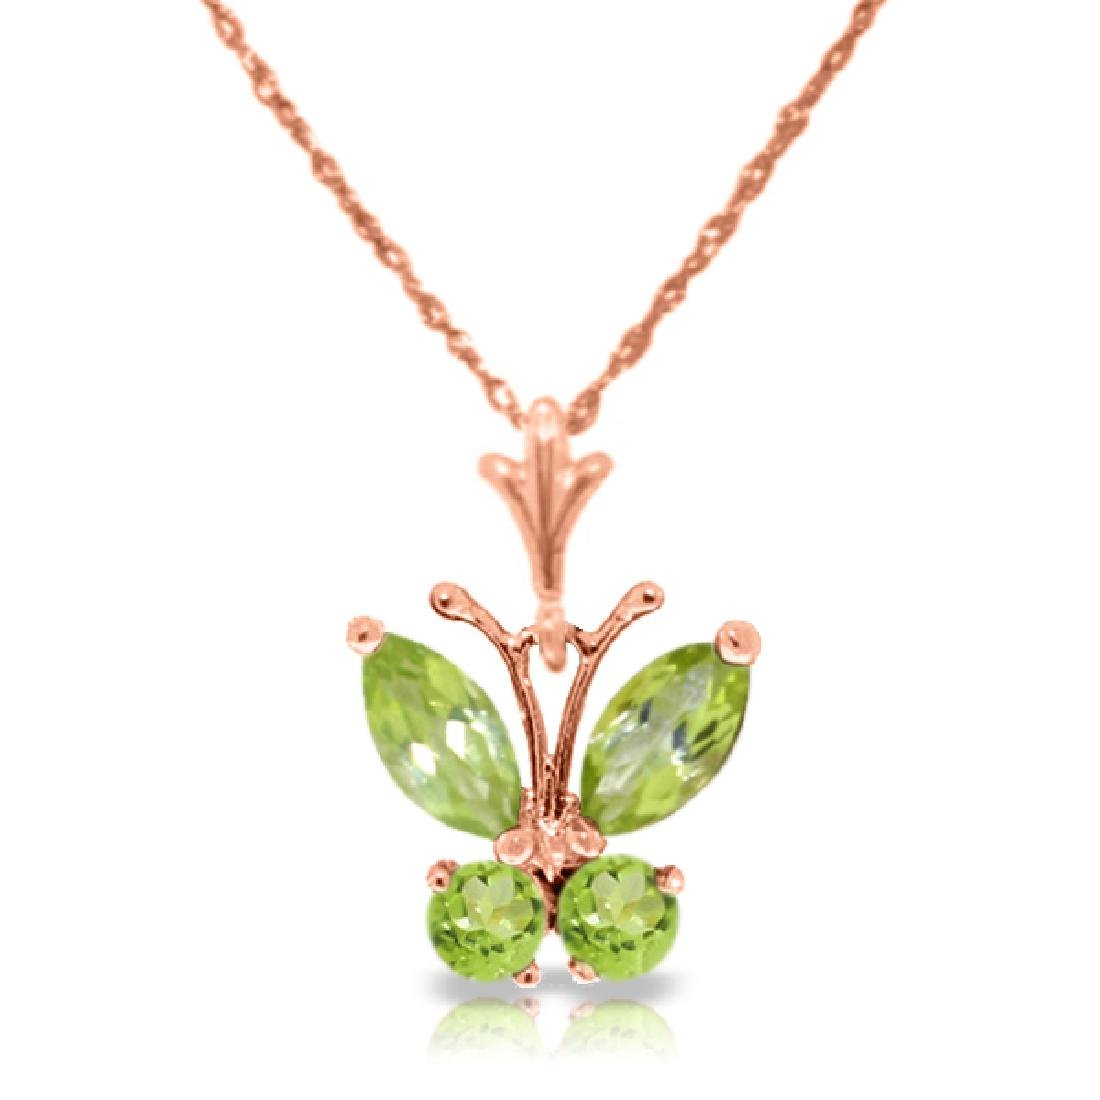 Genuine 0.60 ctw Peridot Necklace Jewelry 14KT Rose